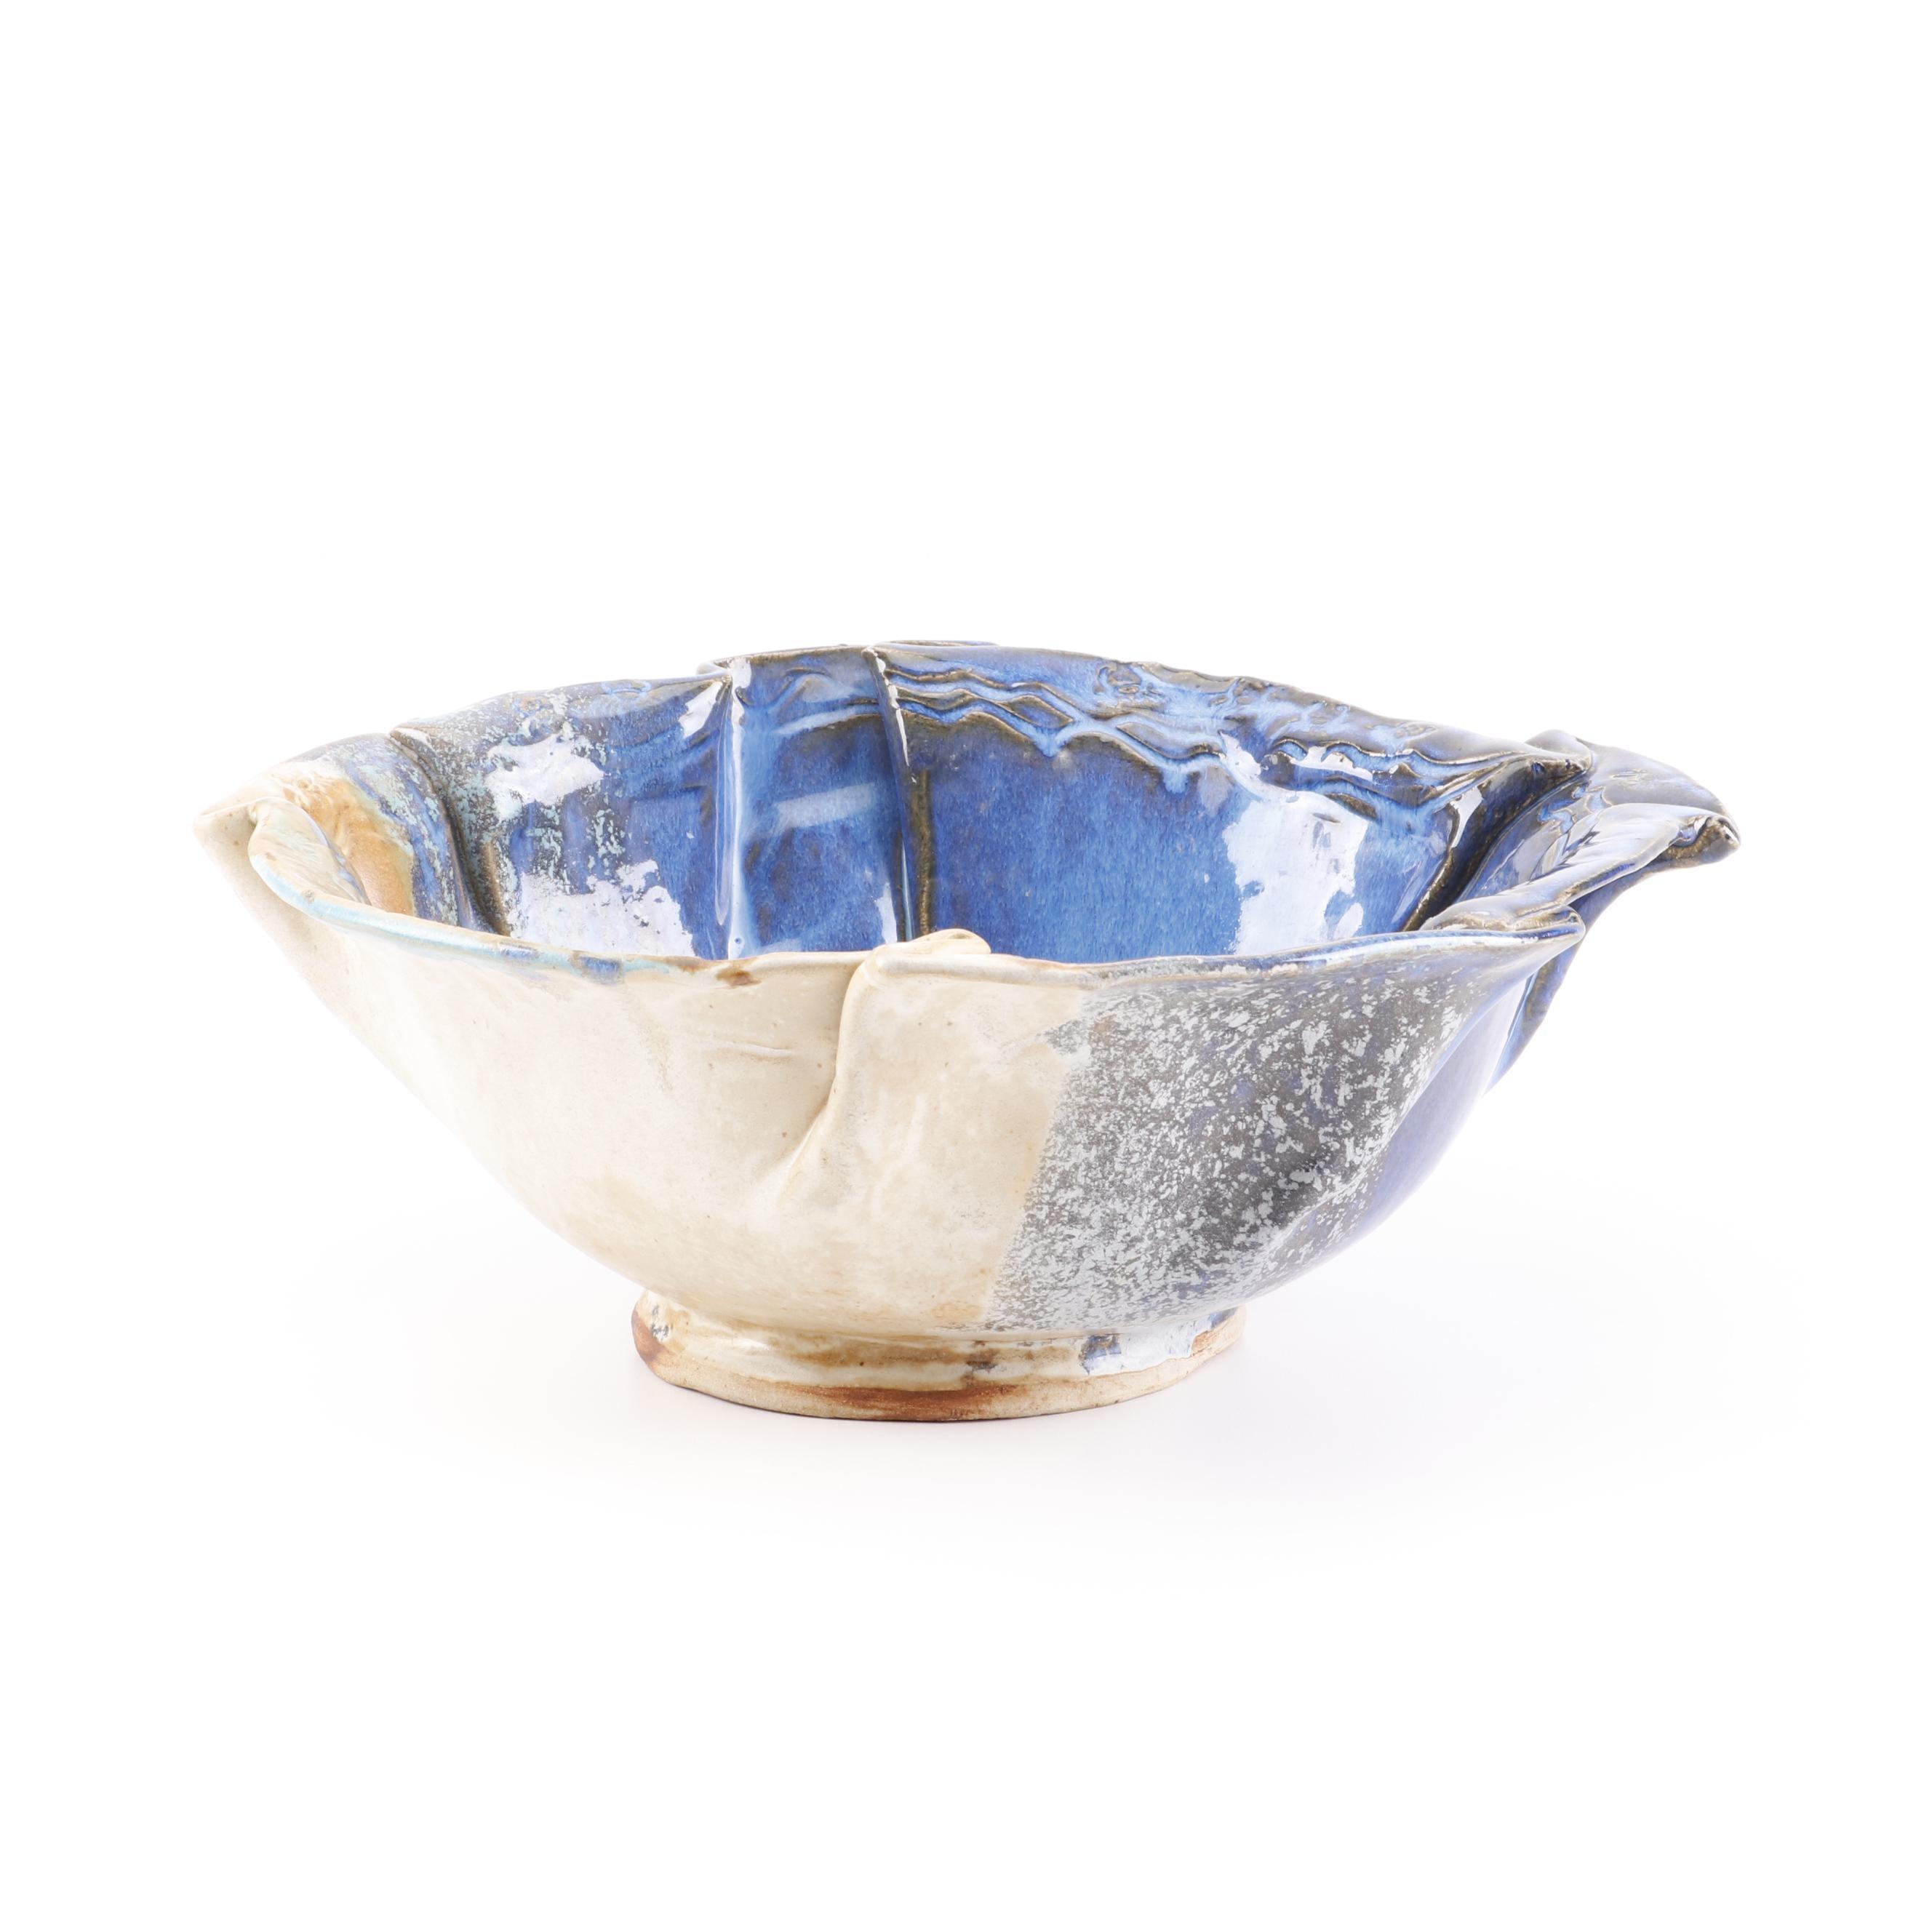 Jason Stokes Holley Hill Pottery Handbuilt Folded Stoneware Serving Bowl, 1999